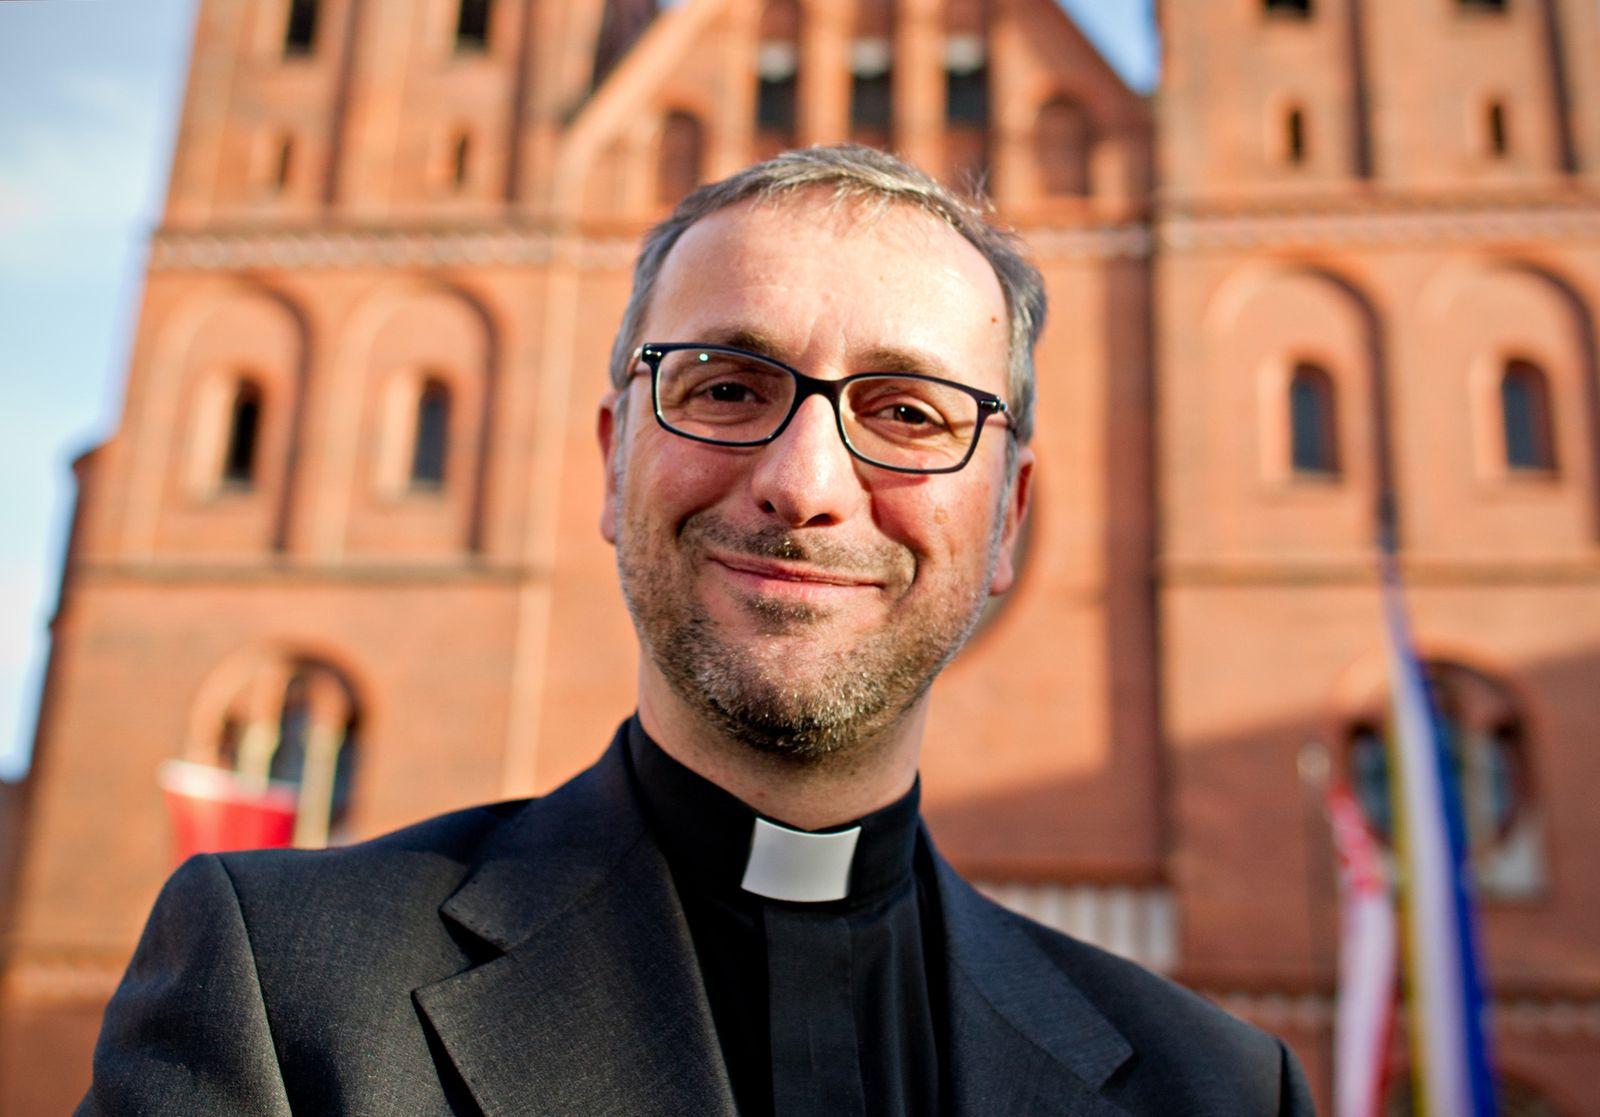 Neuer Erzbischof Stefan Heße